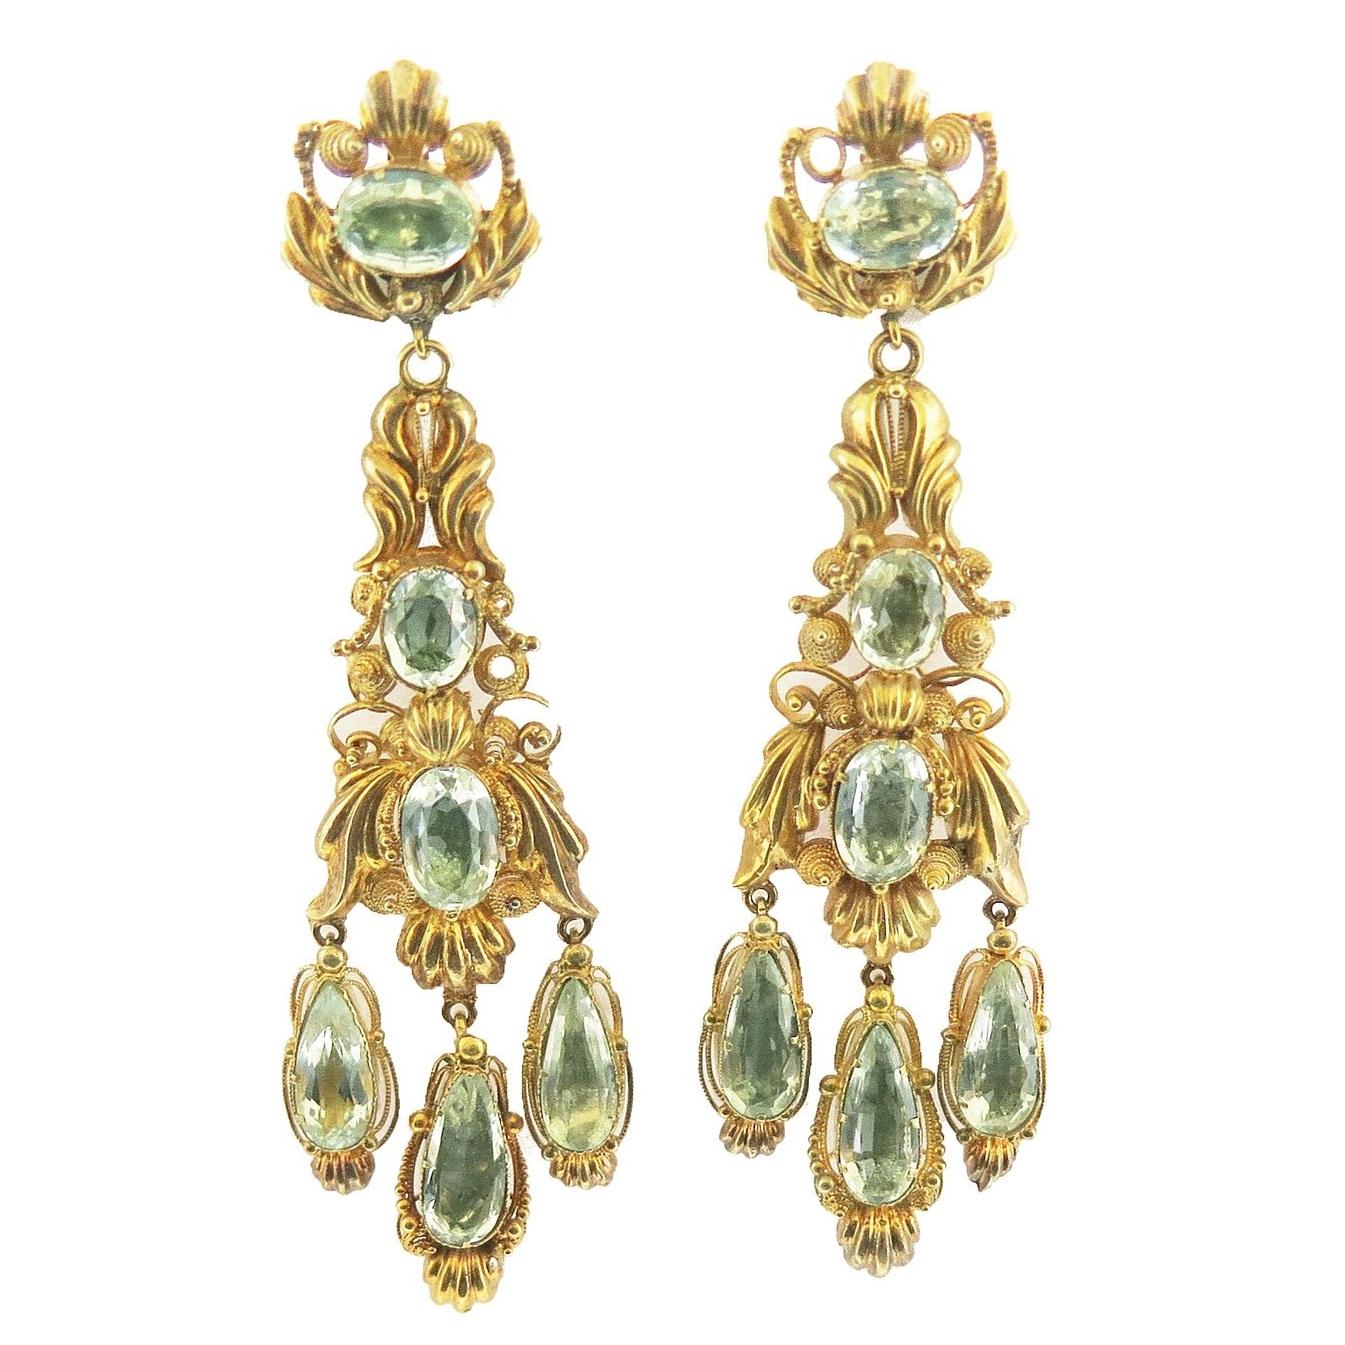 Georgian Repoussè Aquamarine and Gold Earrings